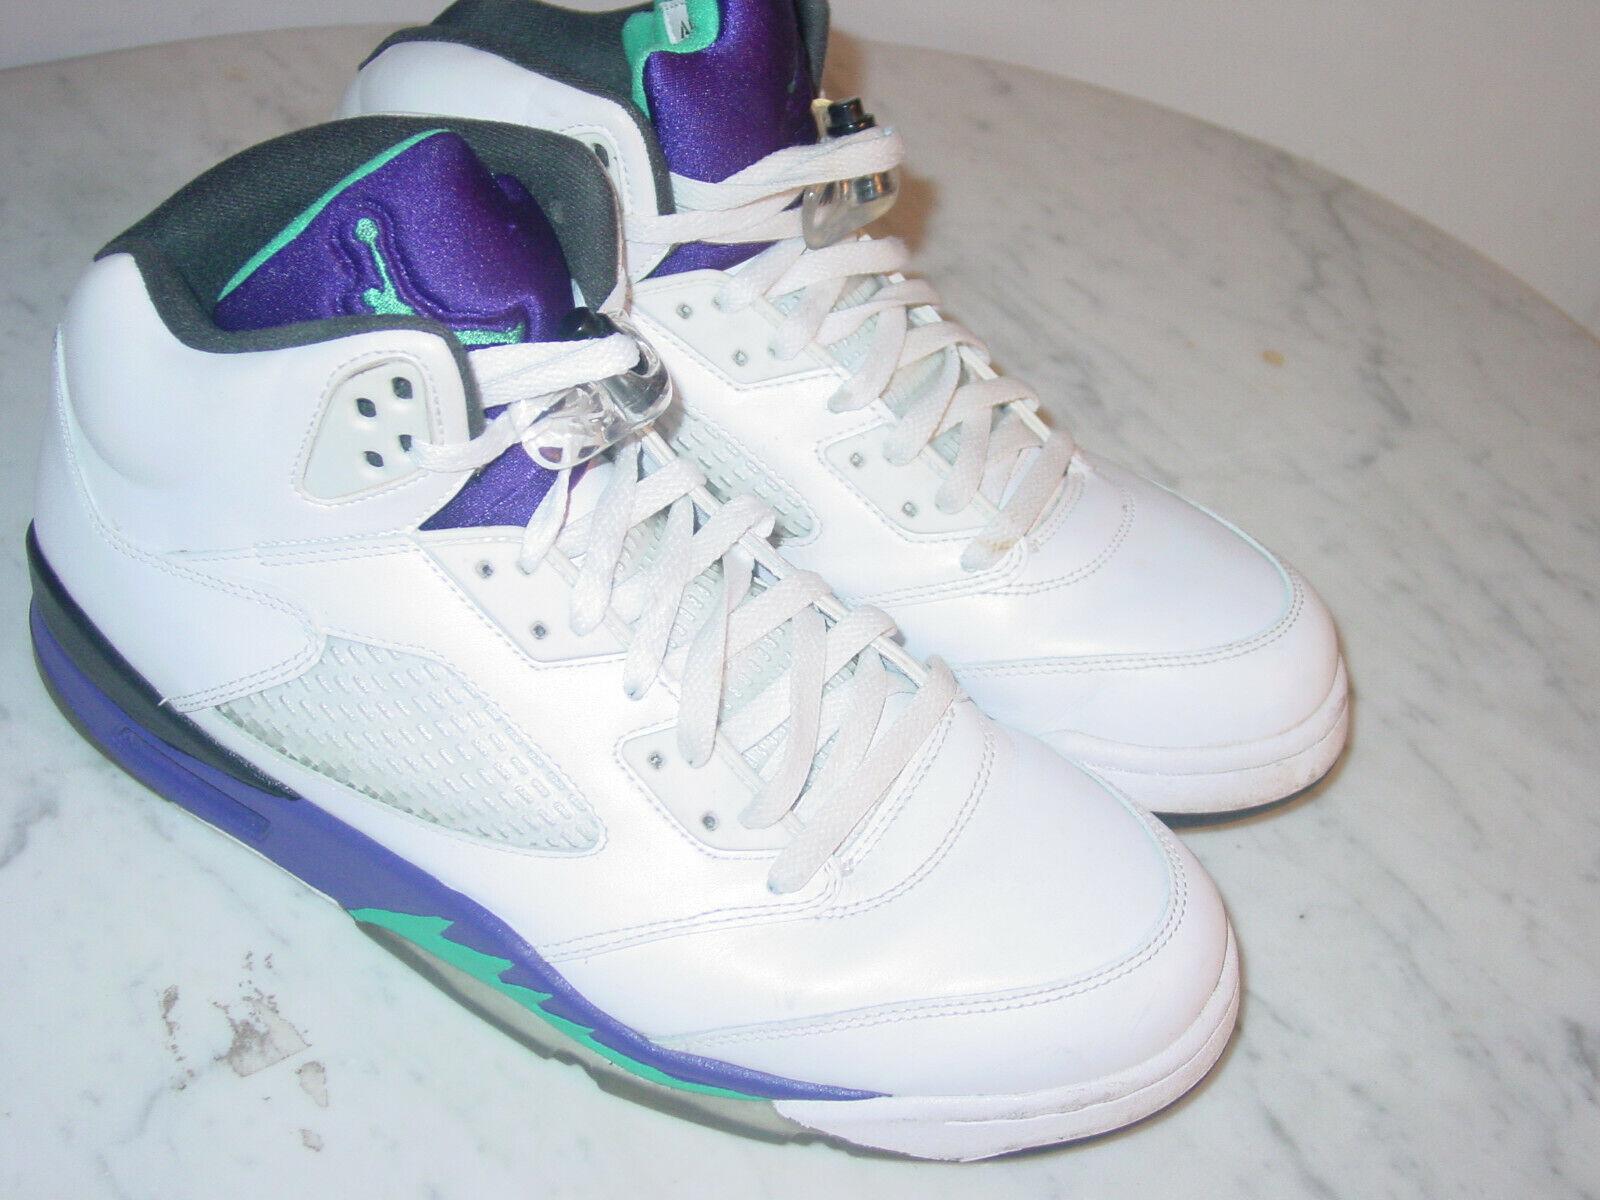 2012 Nike Air Jordan Retro 5  Grape 2013 Release  White Grape Ice shoes Size 11.5